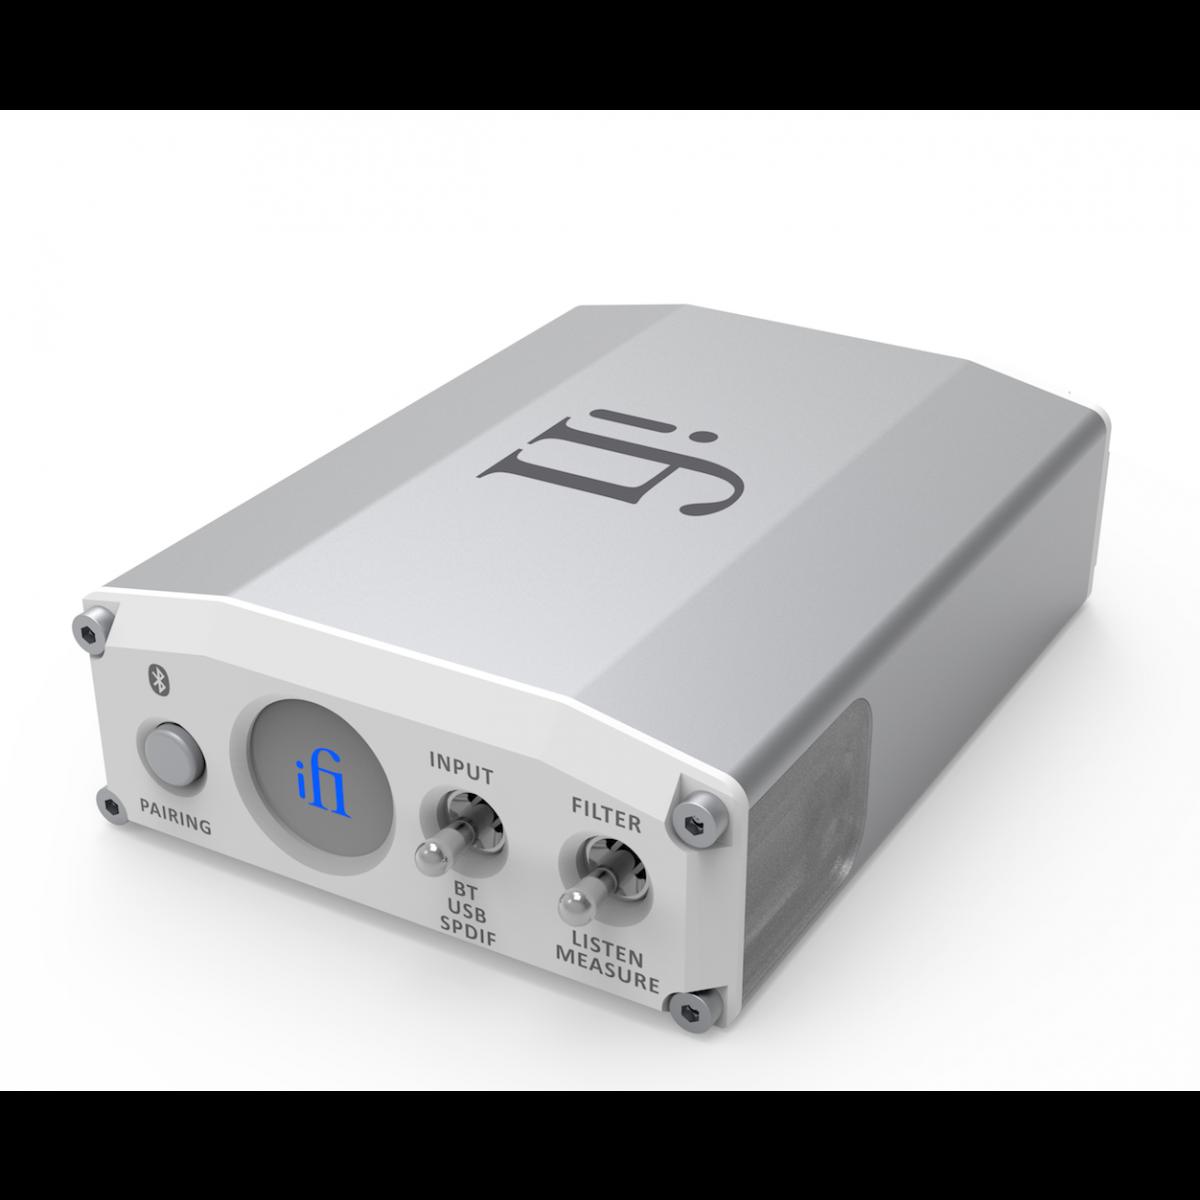 Bluetooth converters